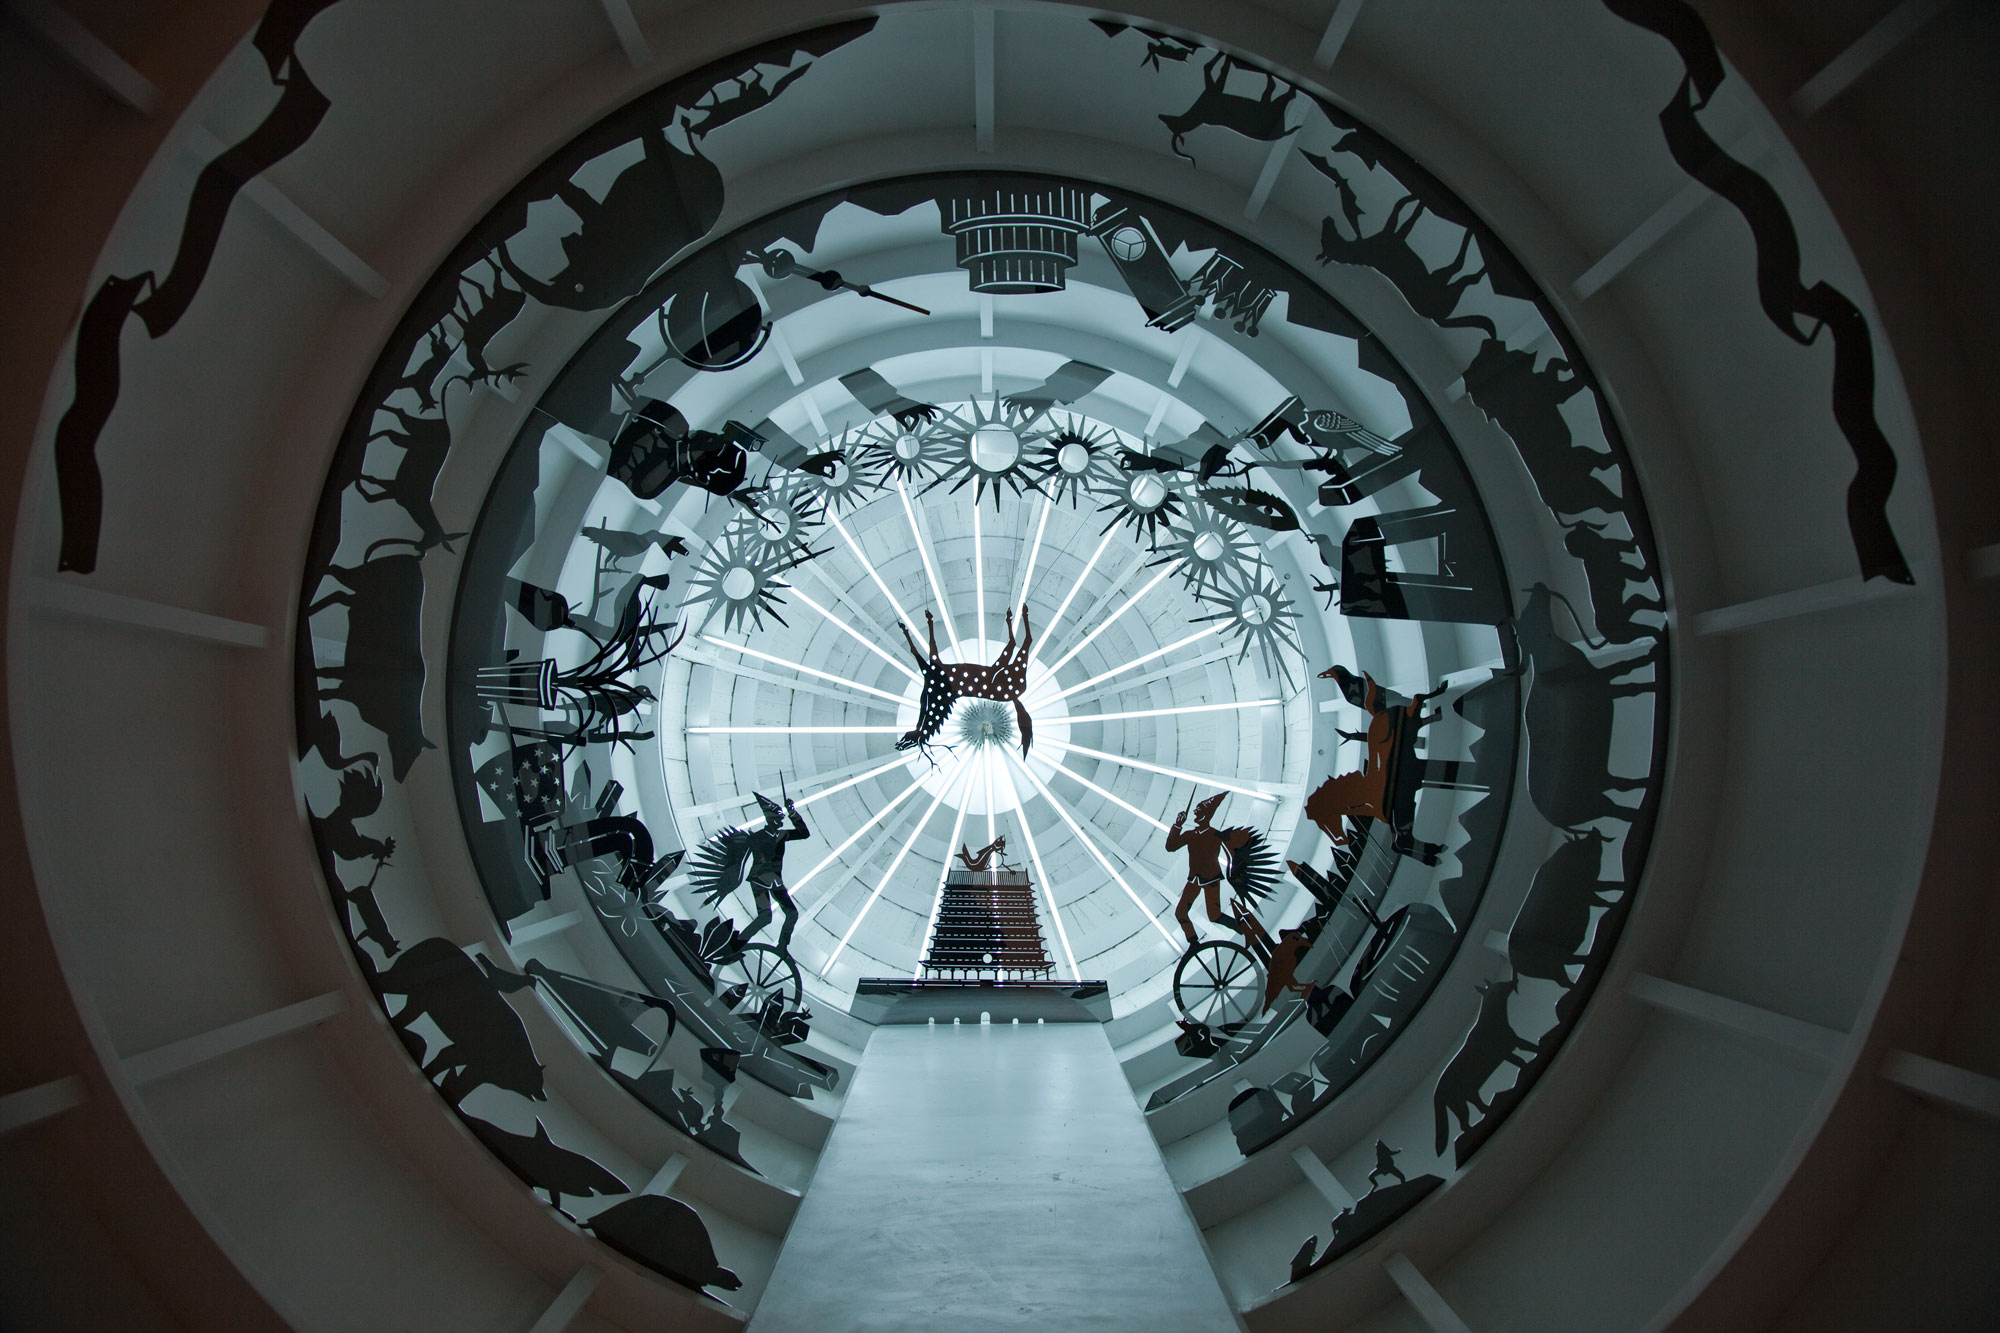 Wu Junyong 吴俊勇, Time of Stomach 时间的胃, 2011, Muti-media video installation 录像、装置、绘画, 250 x 400 x 400 cm x 2